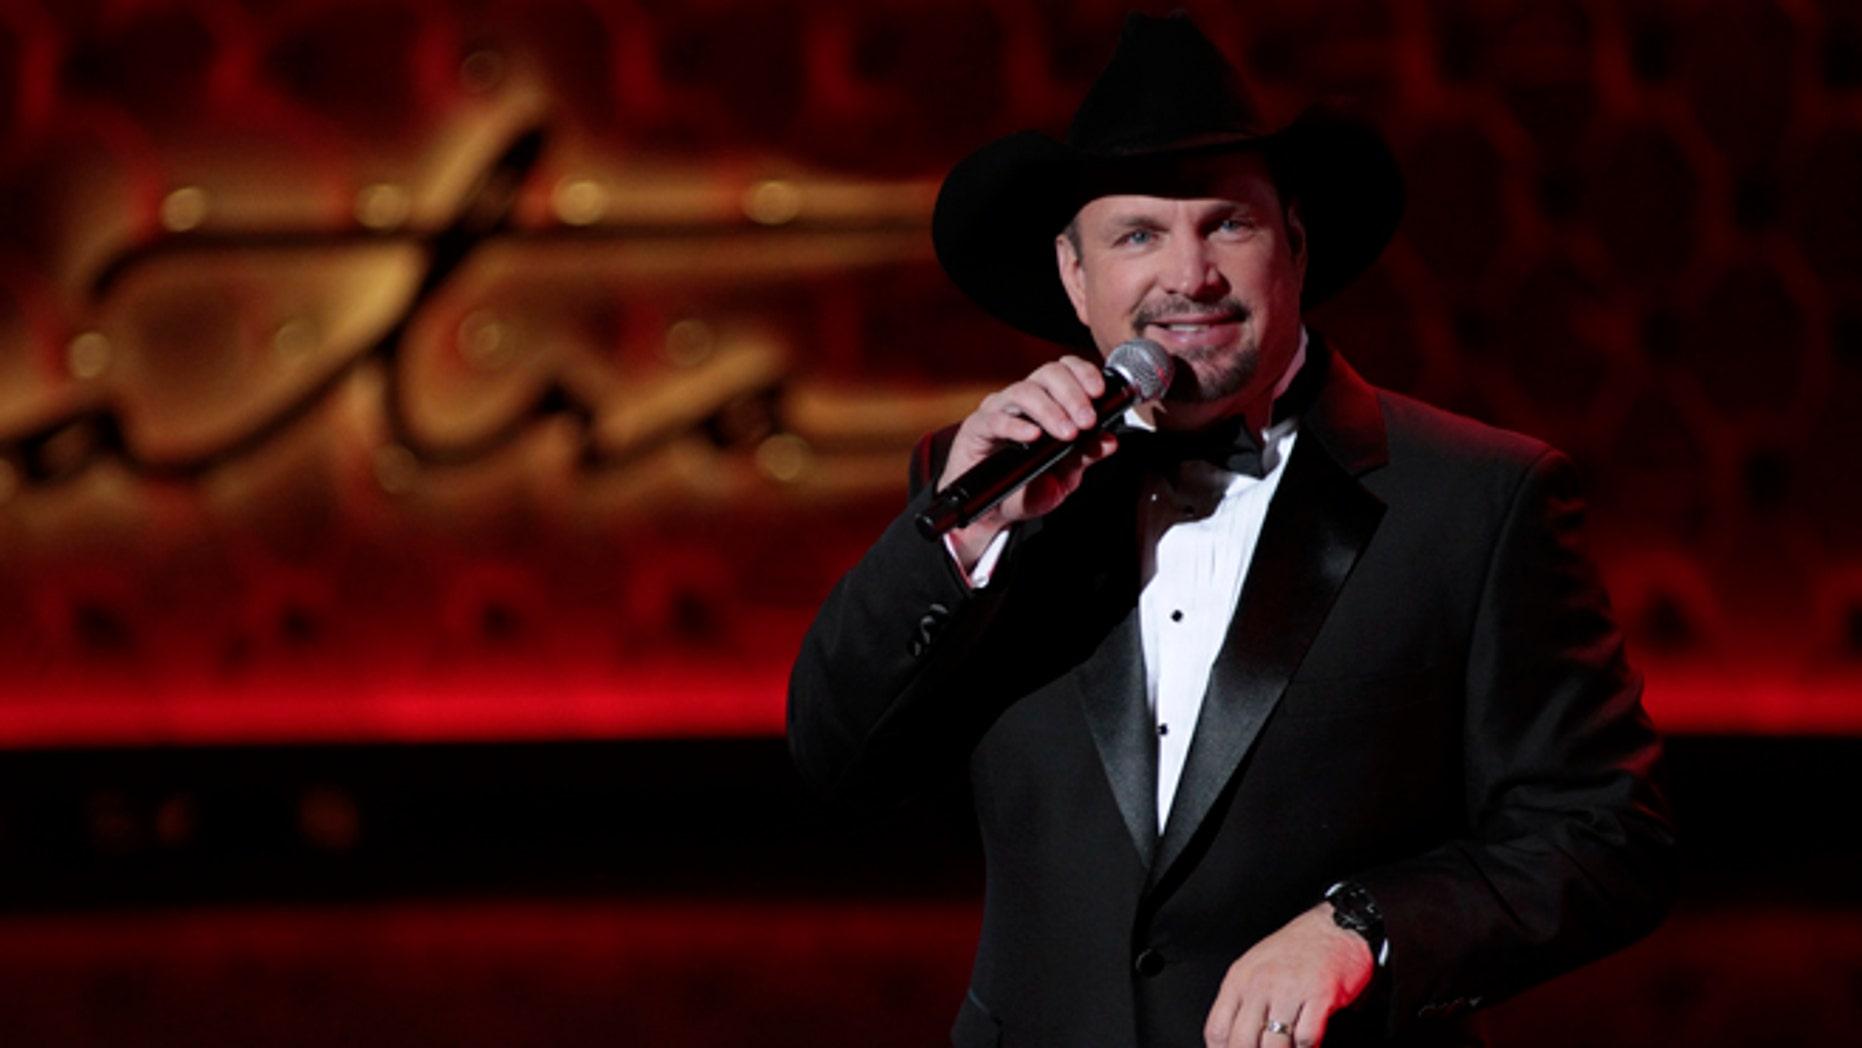 December 2, 2015. Singer Garth Brooks performs during Sinatra 100 - An All-Star Grammy Concert in Las Vegas, Nevada.